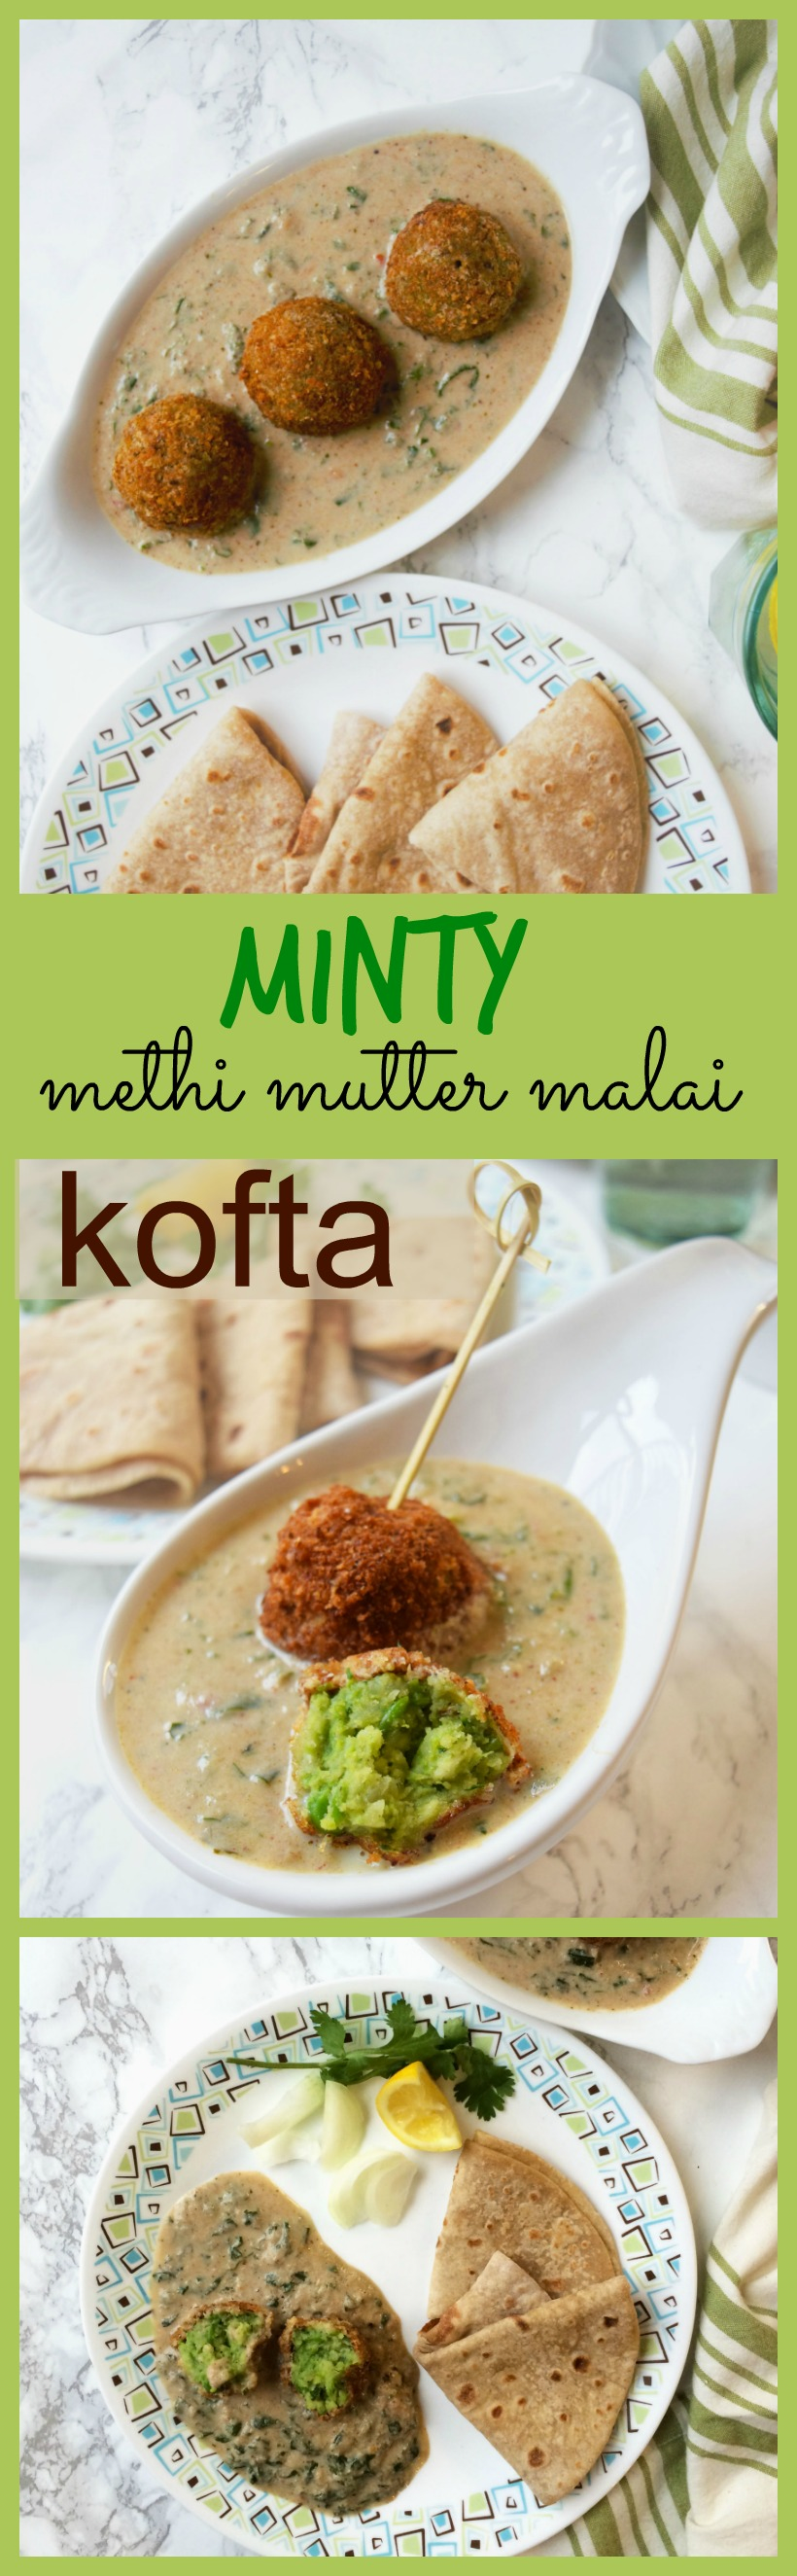 Minty methi mutter malai kofta